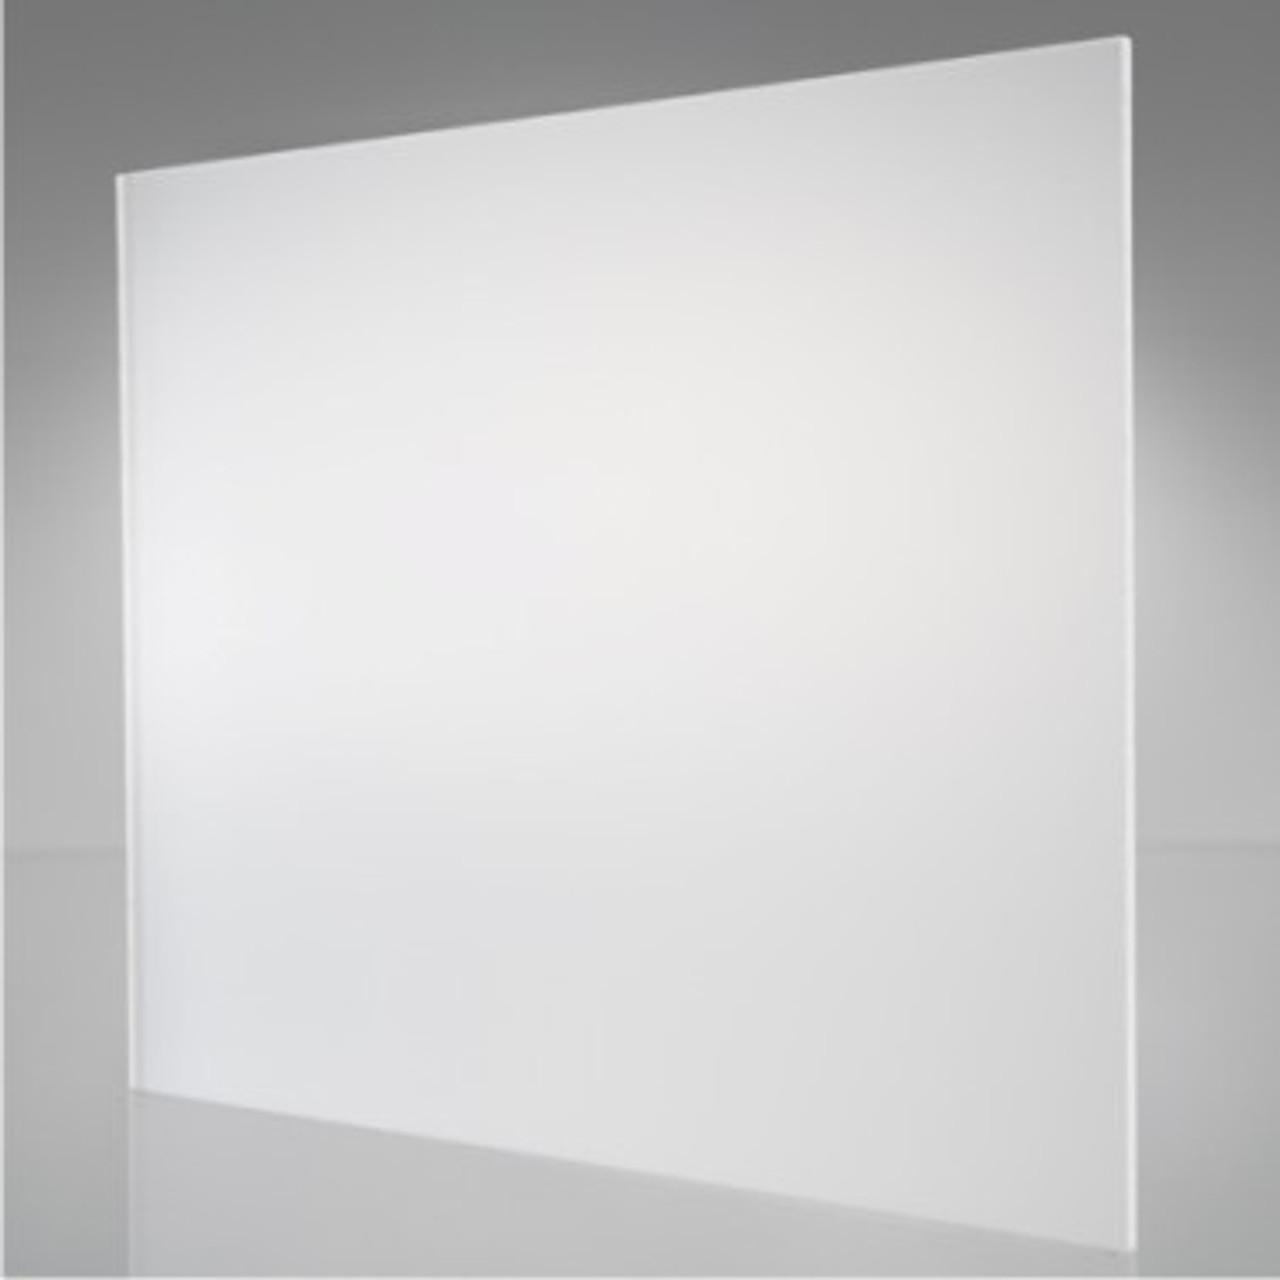 "4' x 8' x 1/8"" Translucent-White Acrylic, P95 ( 1 side matte )"